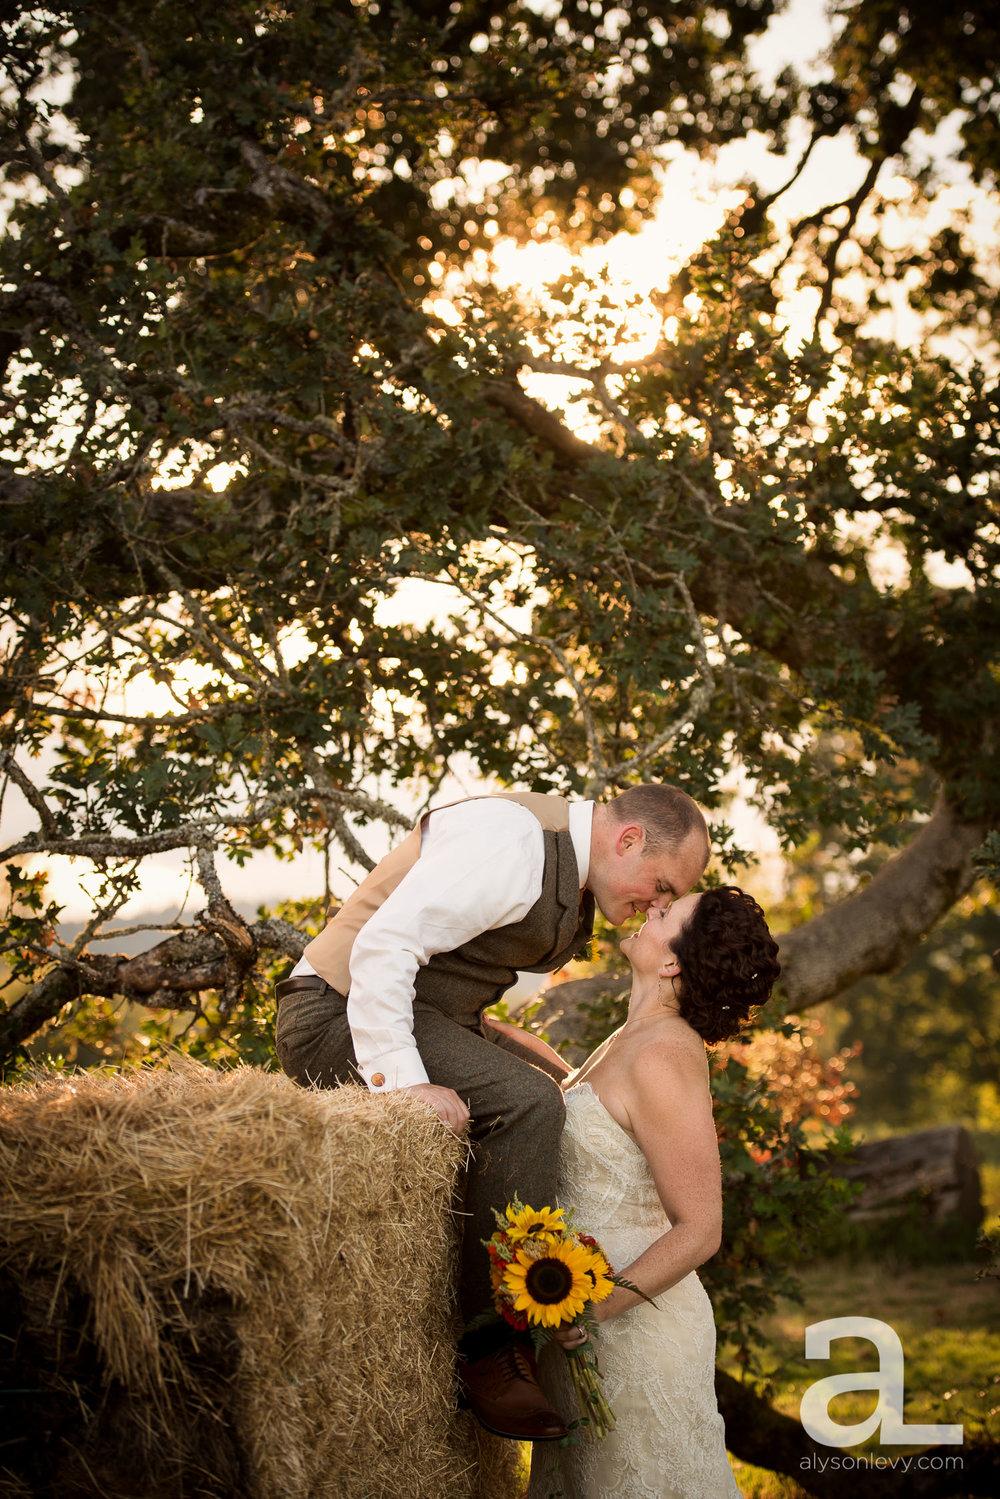 Krugers-Farm-Sauvie-Island-Wedding-Photography-023.jpg